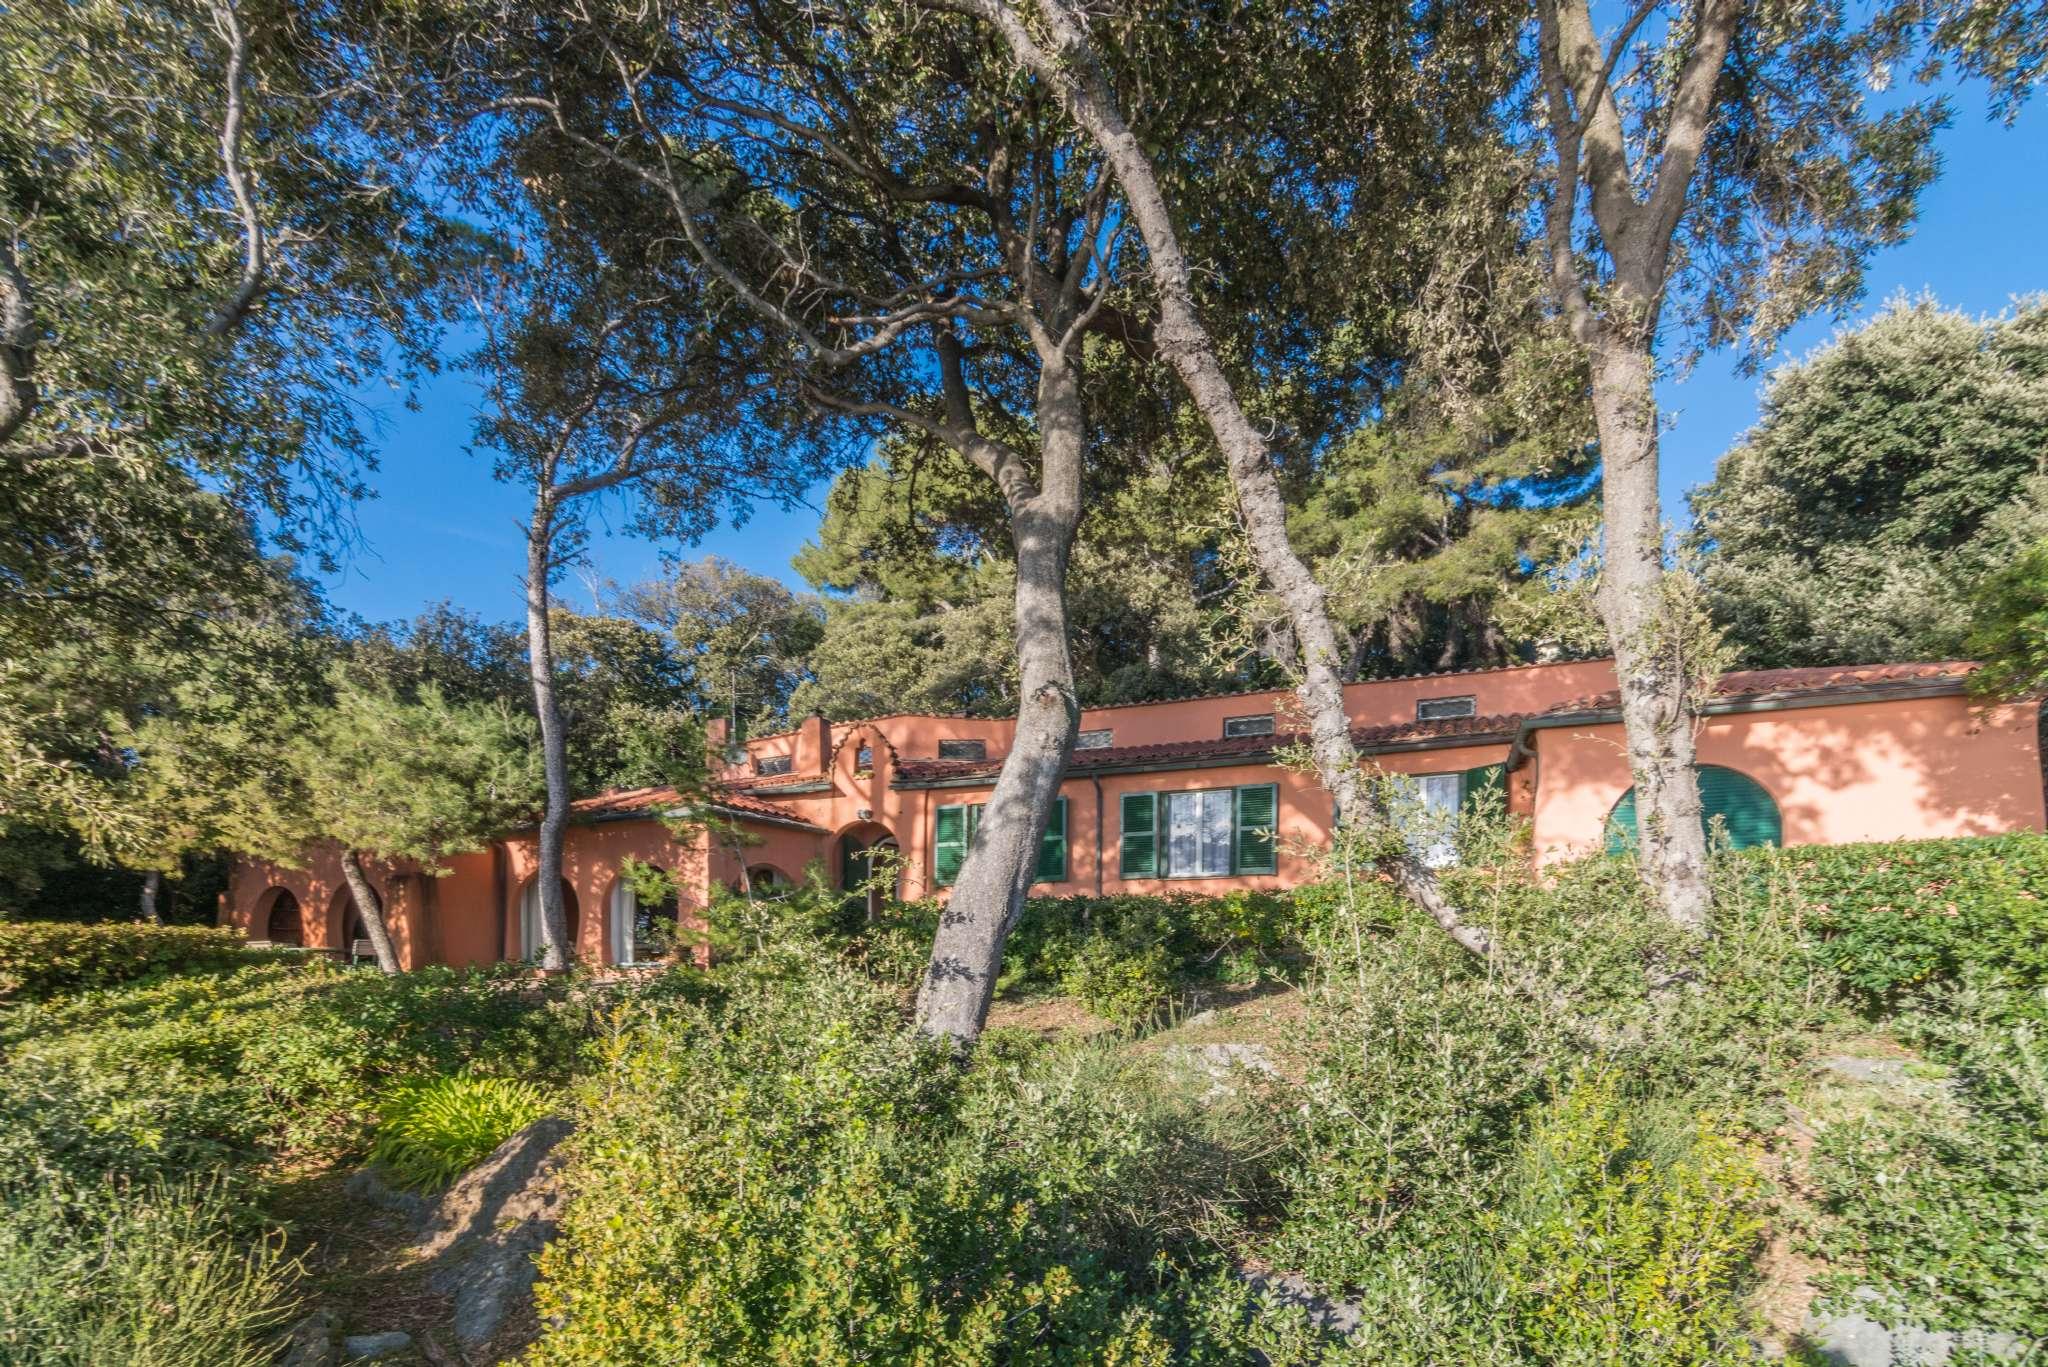 Villa in Vendita a Lerici: 5 locali, 340 mq - Foto 5